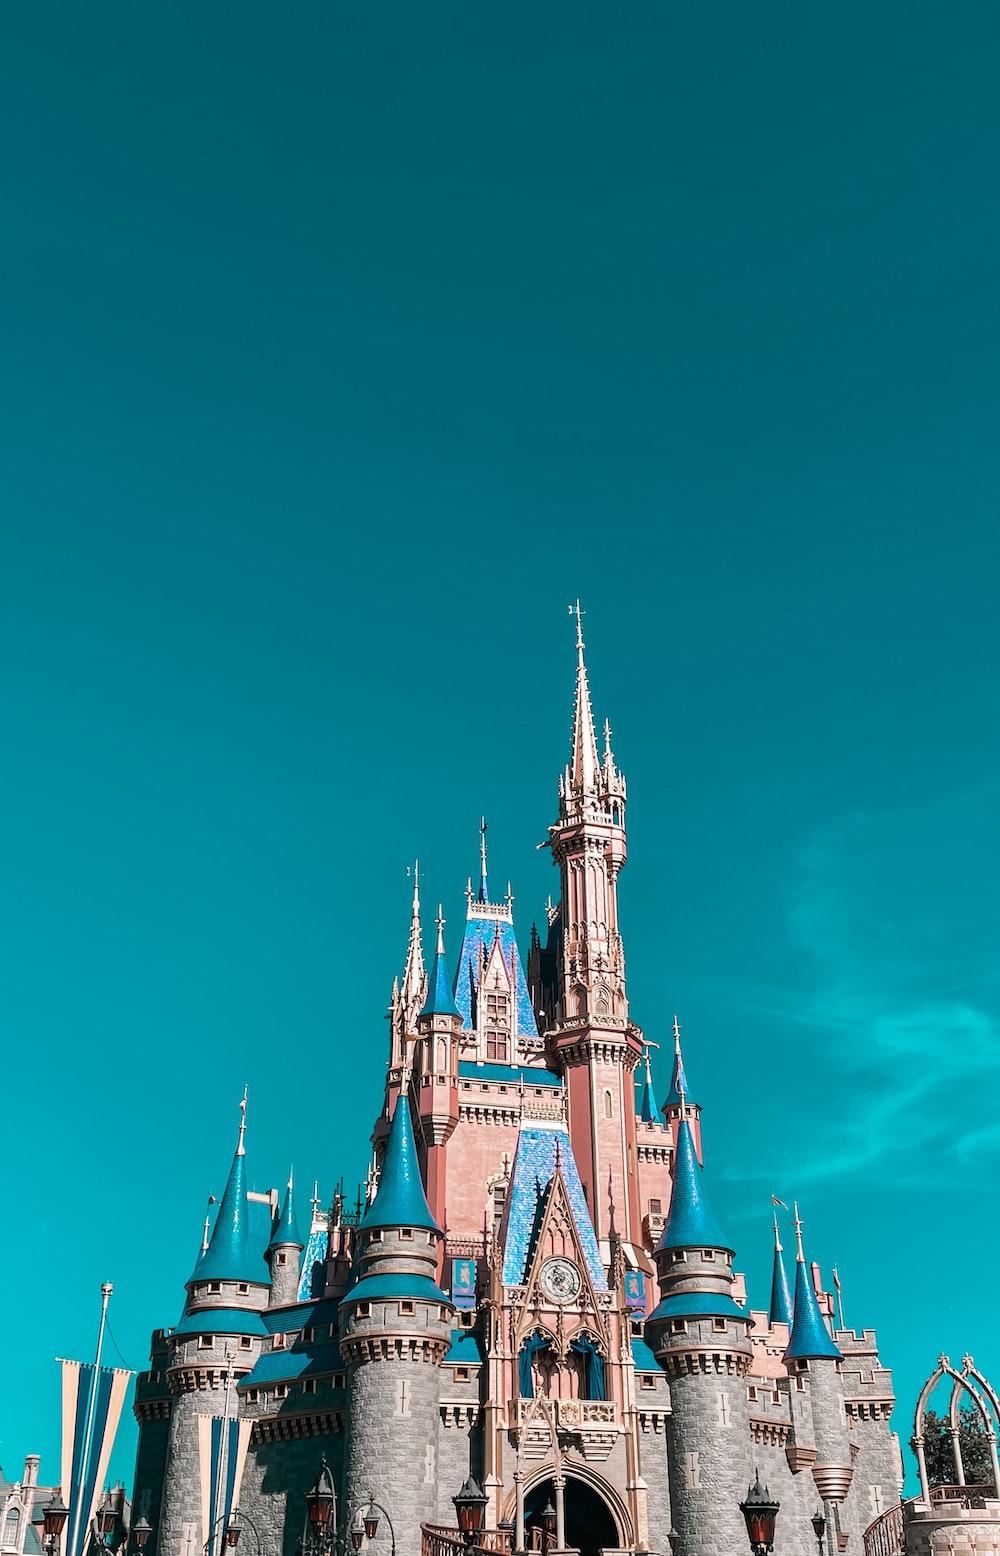 blue and white castle under blue sky